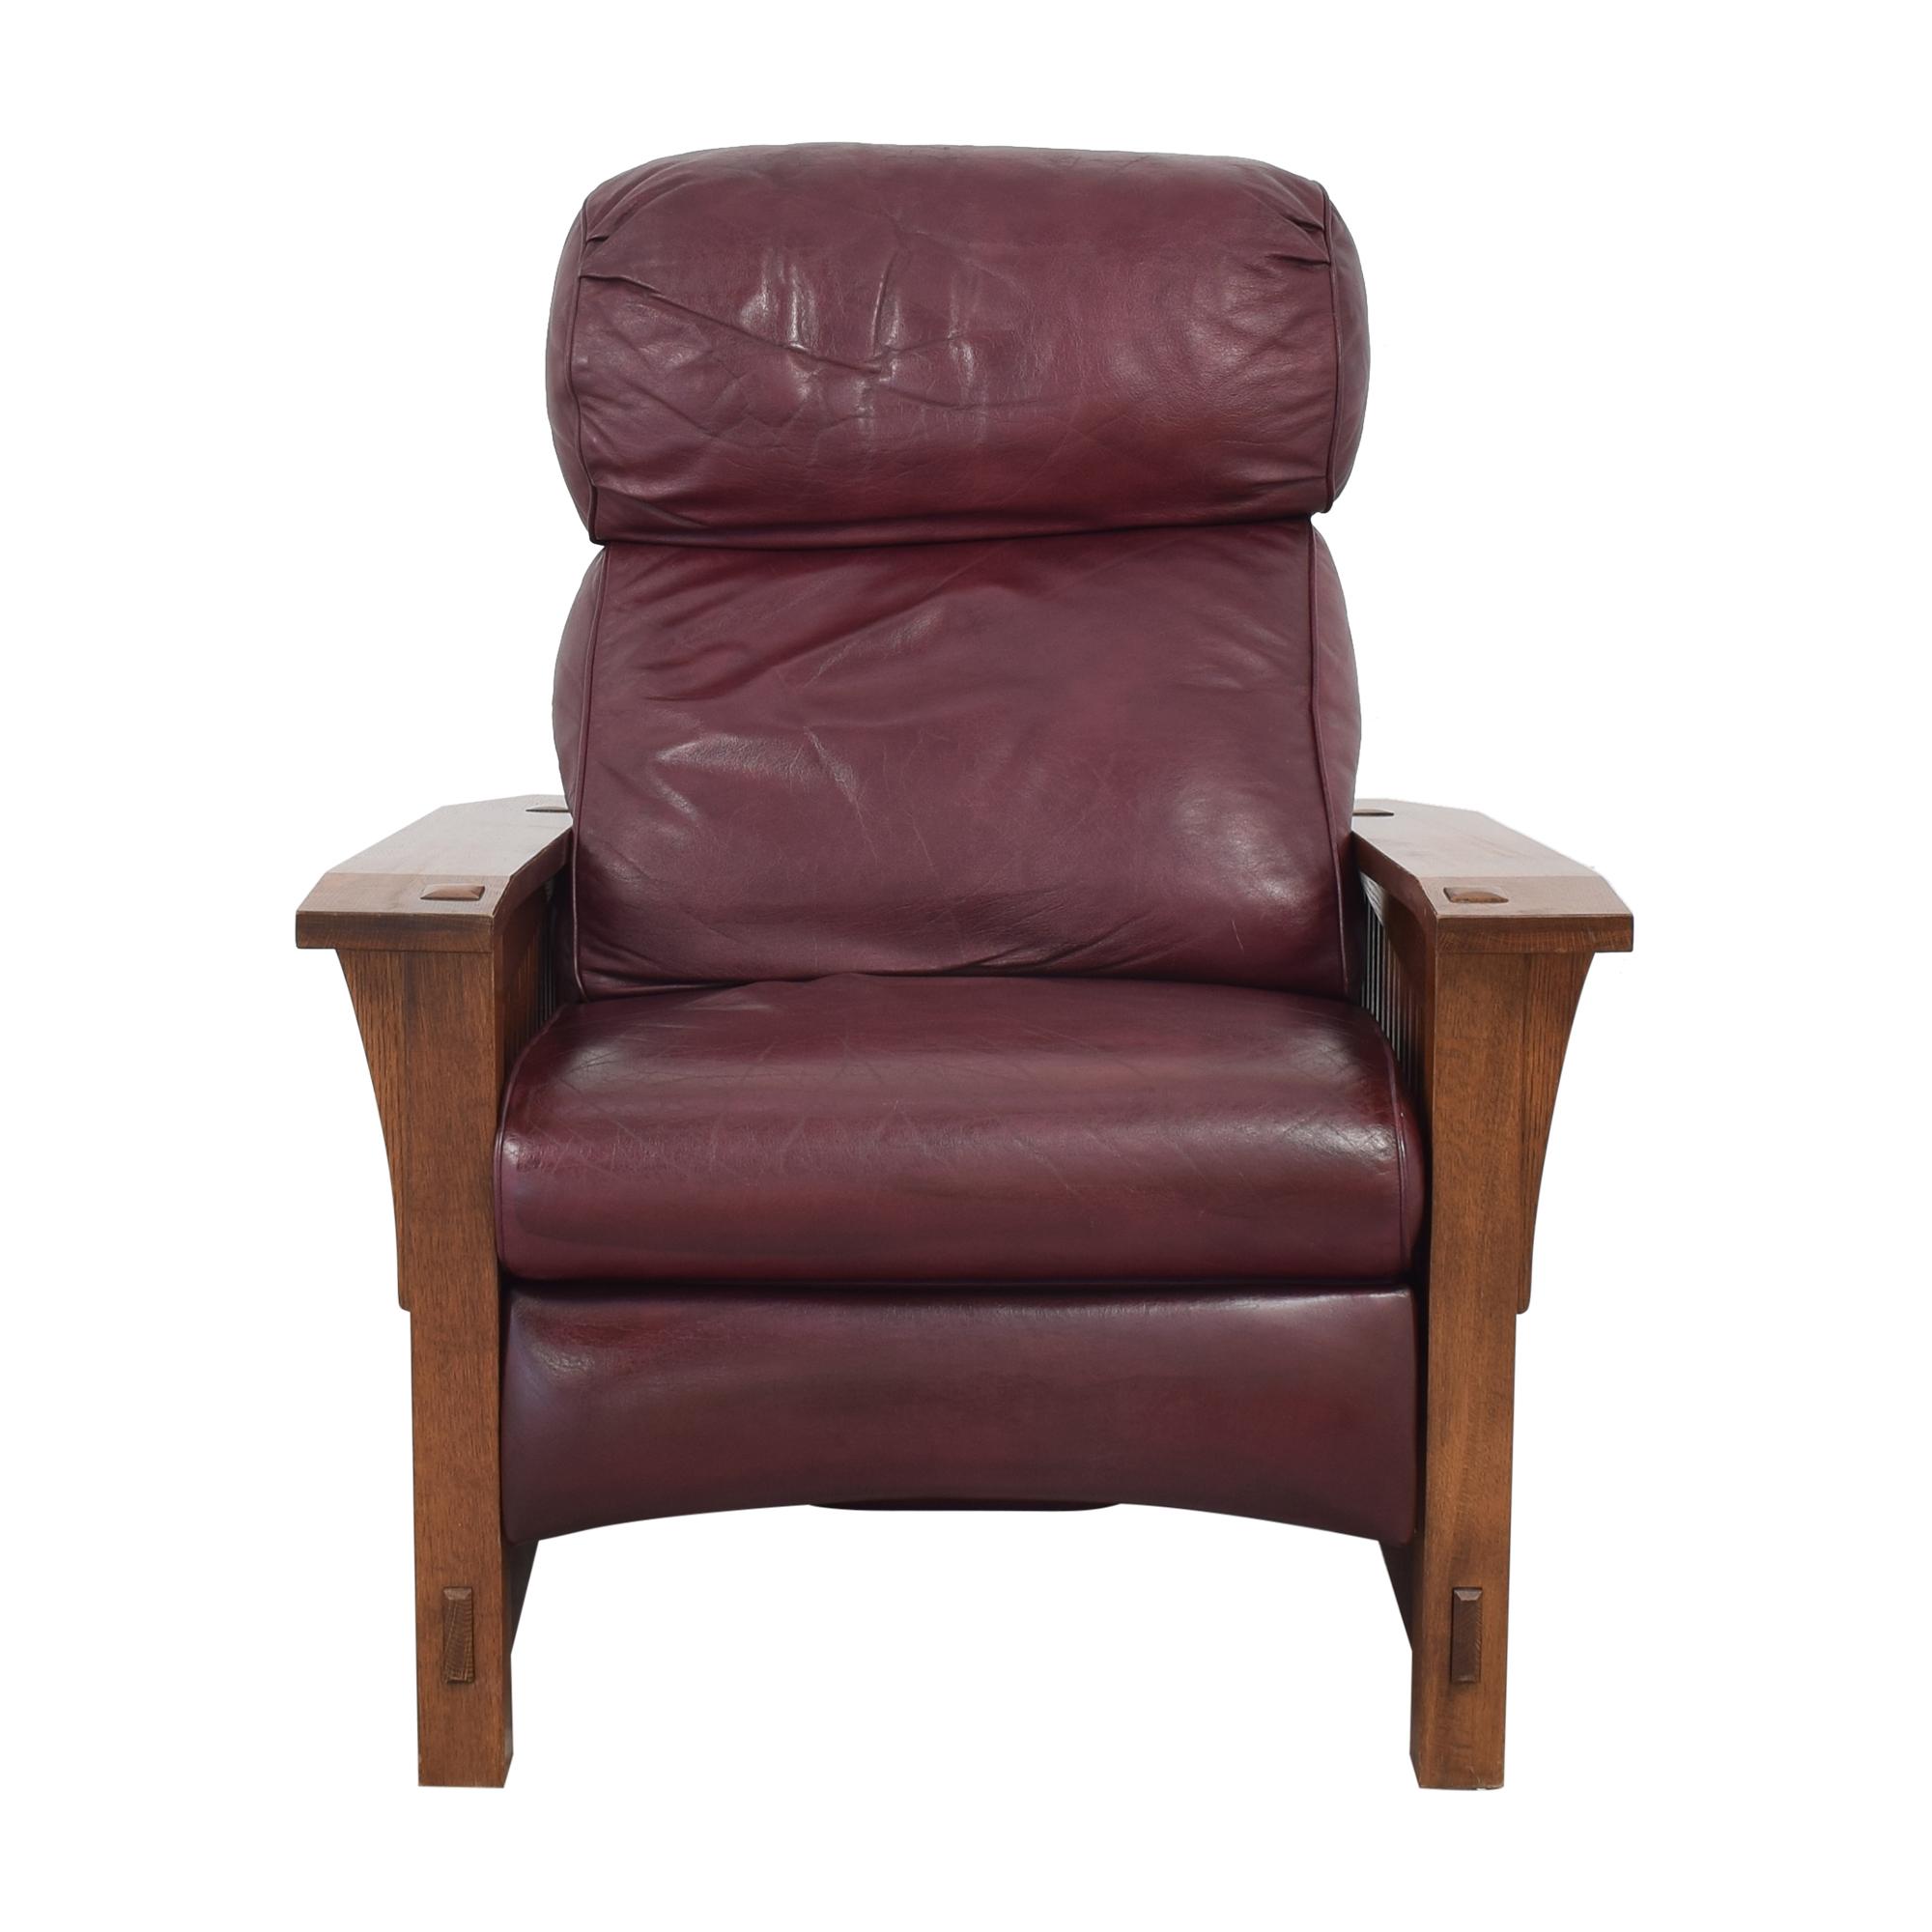 Stickley Furniture Stickley Spindle Morris Recliner red & brown